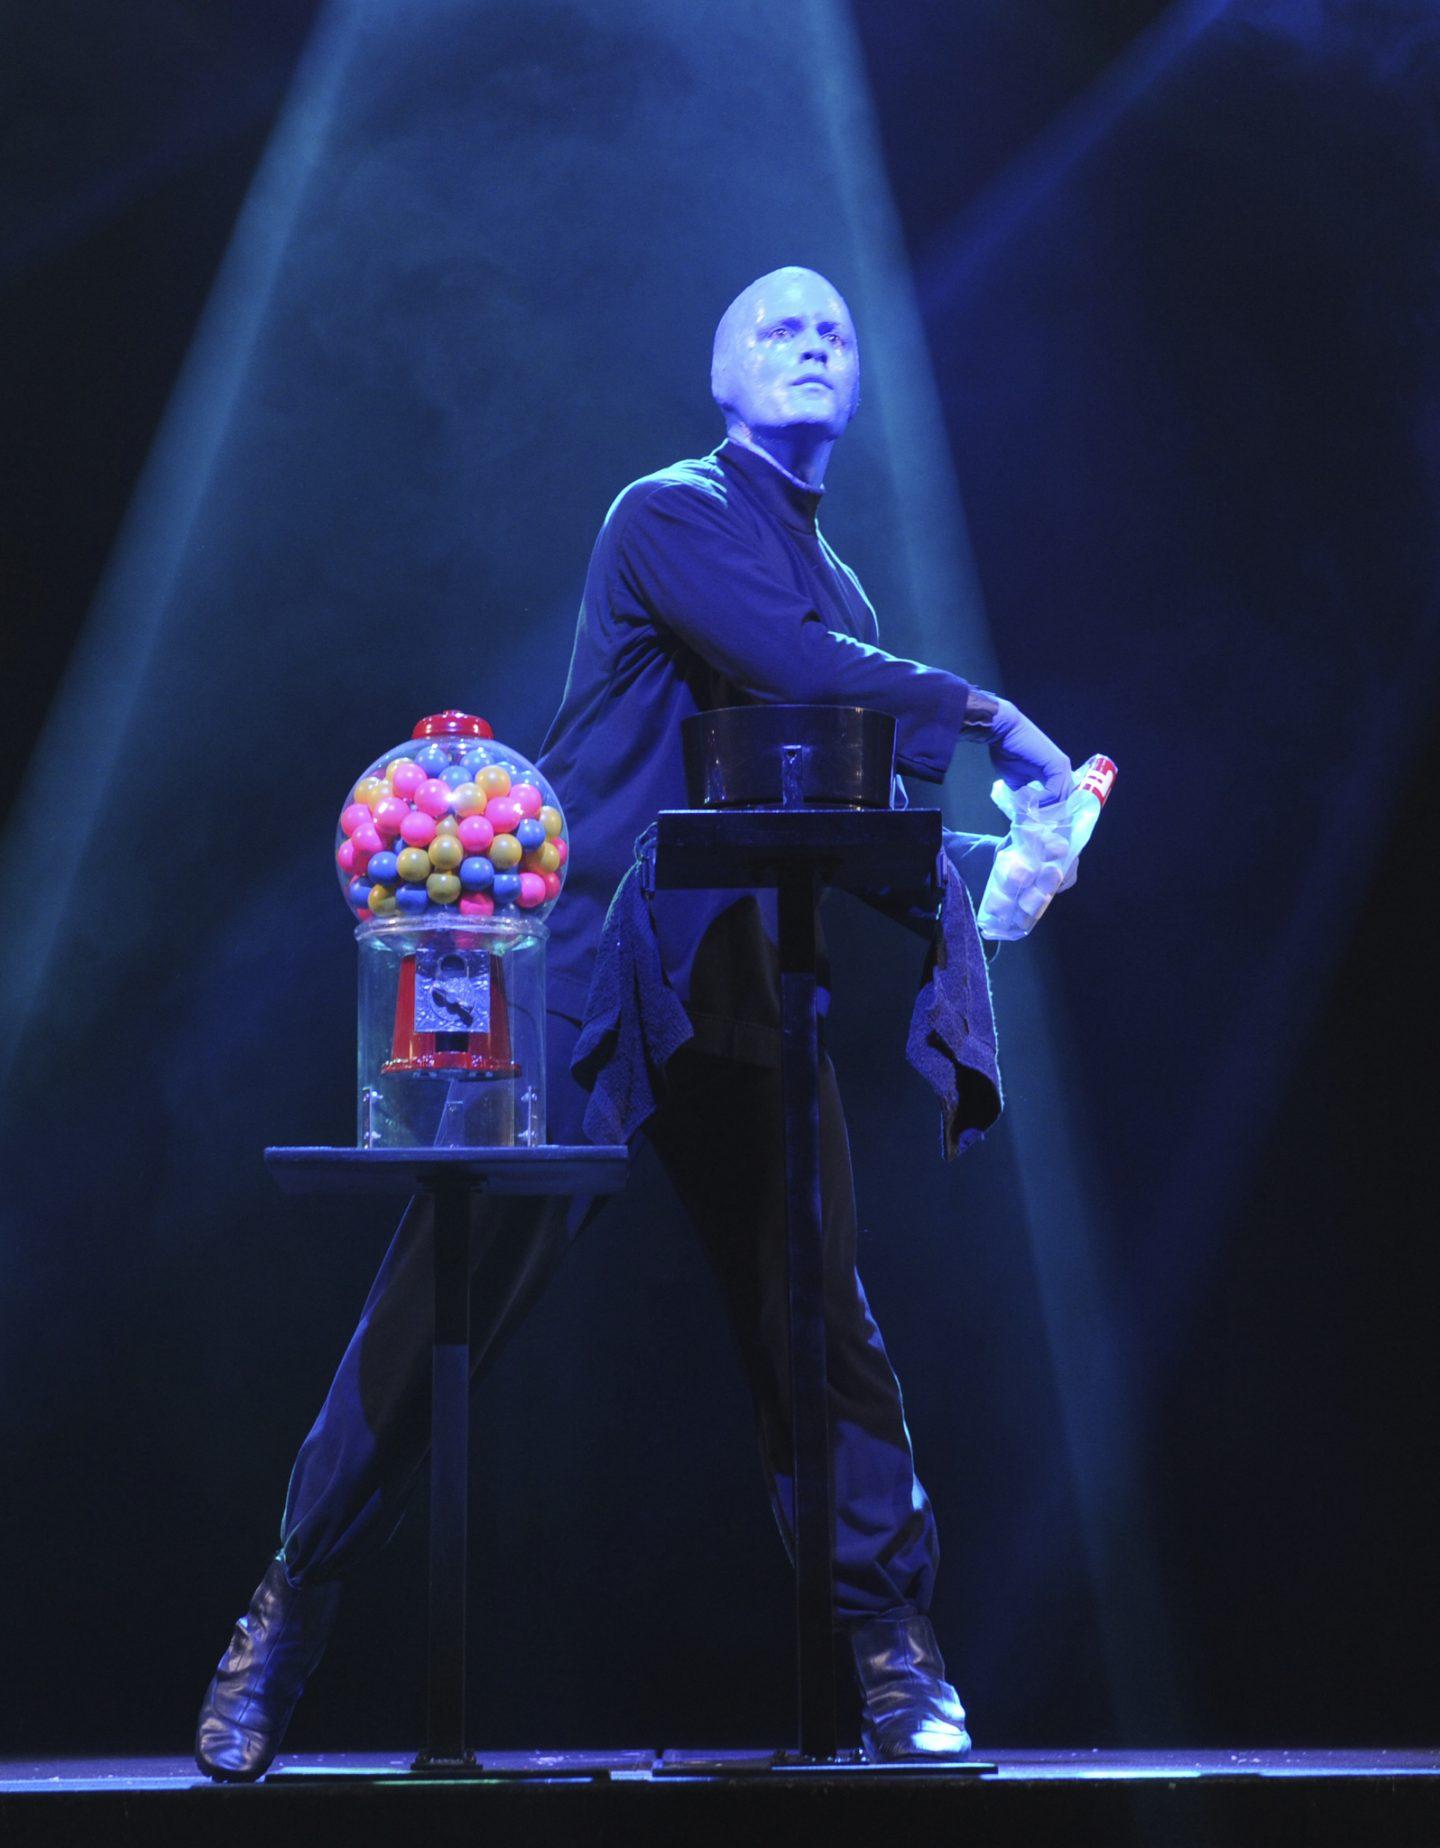 Blue Man Group show kid-friendly